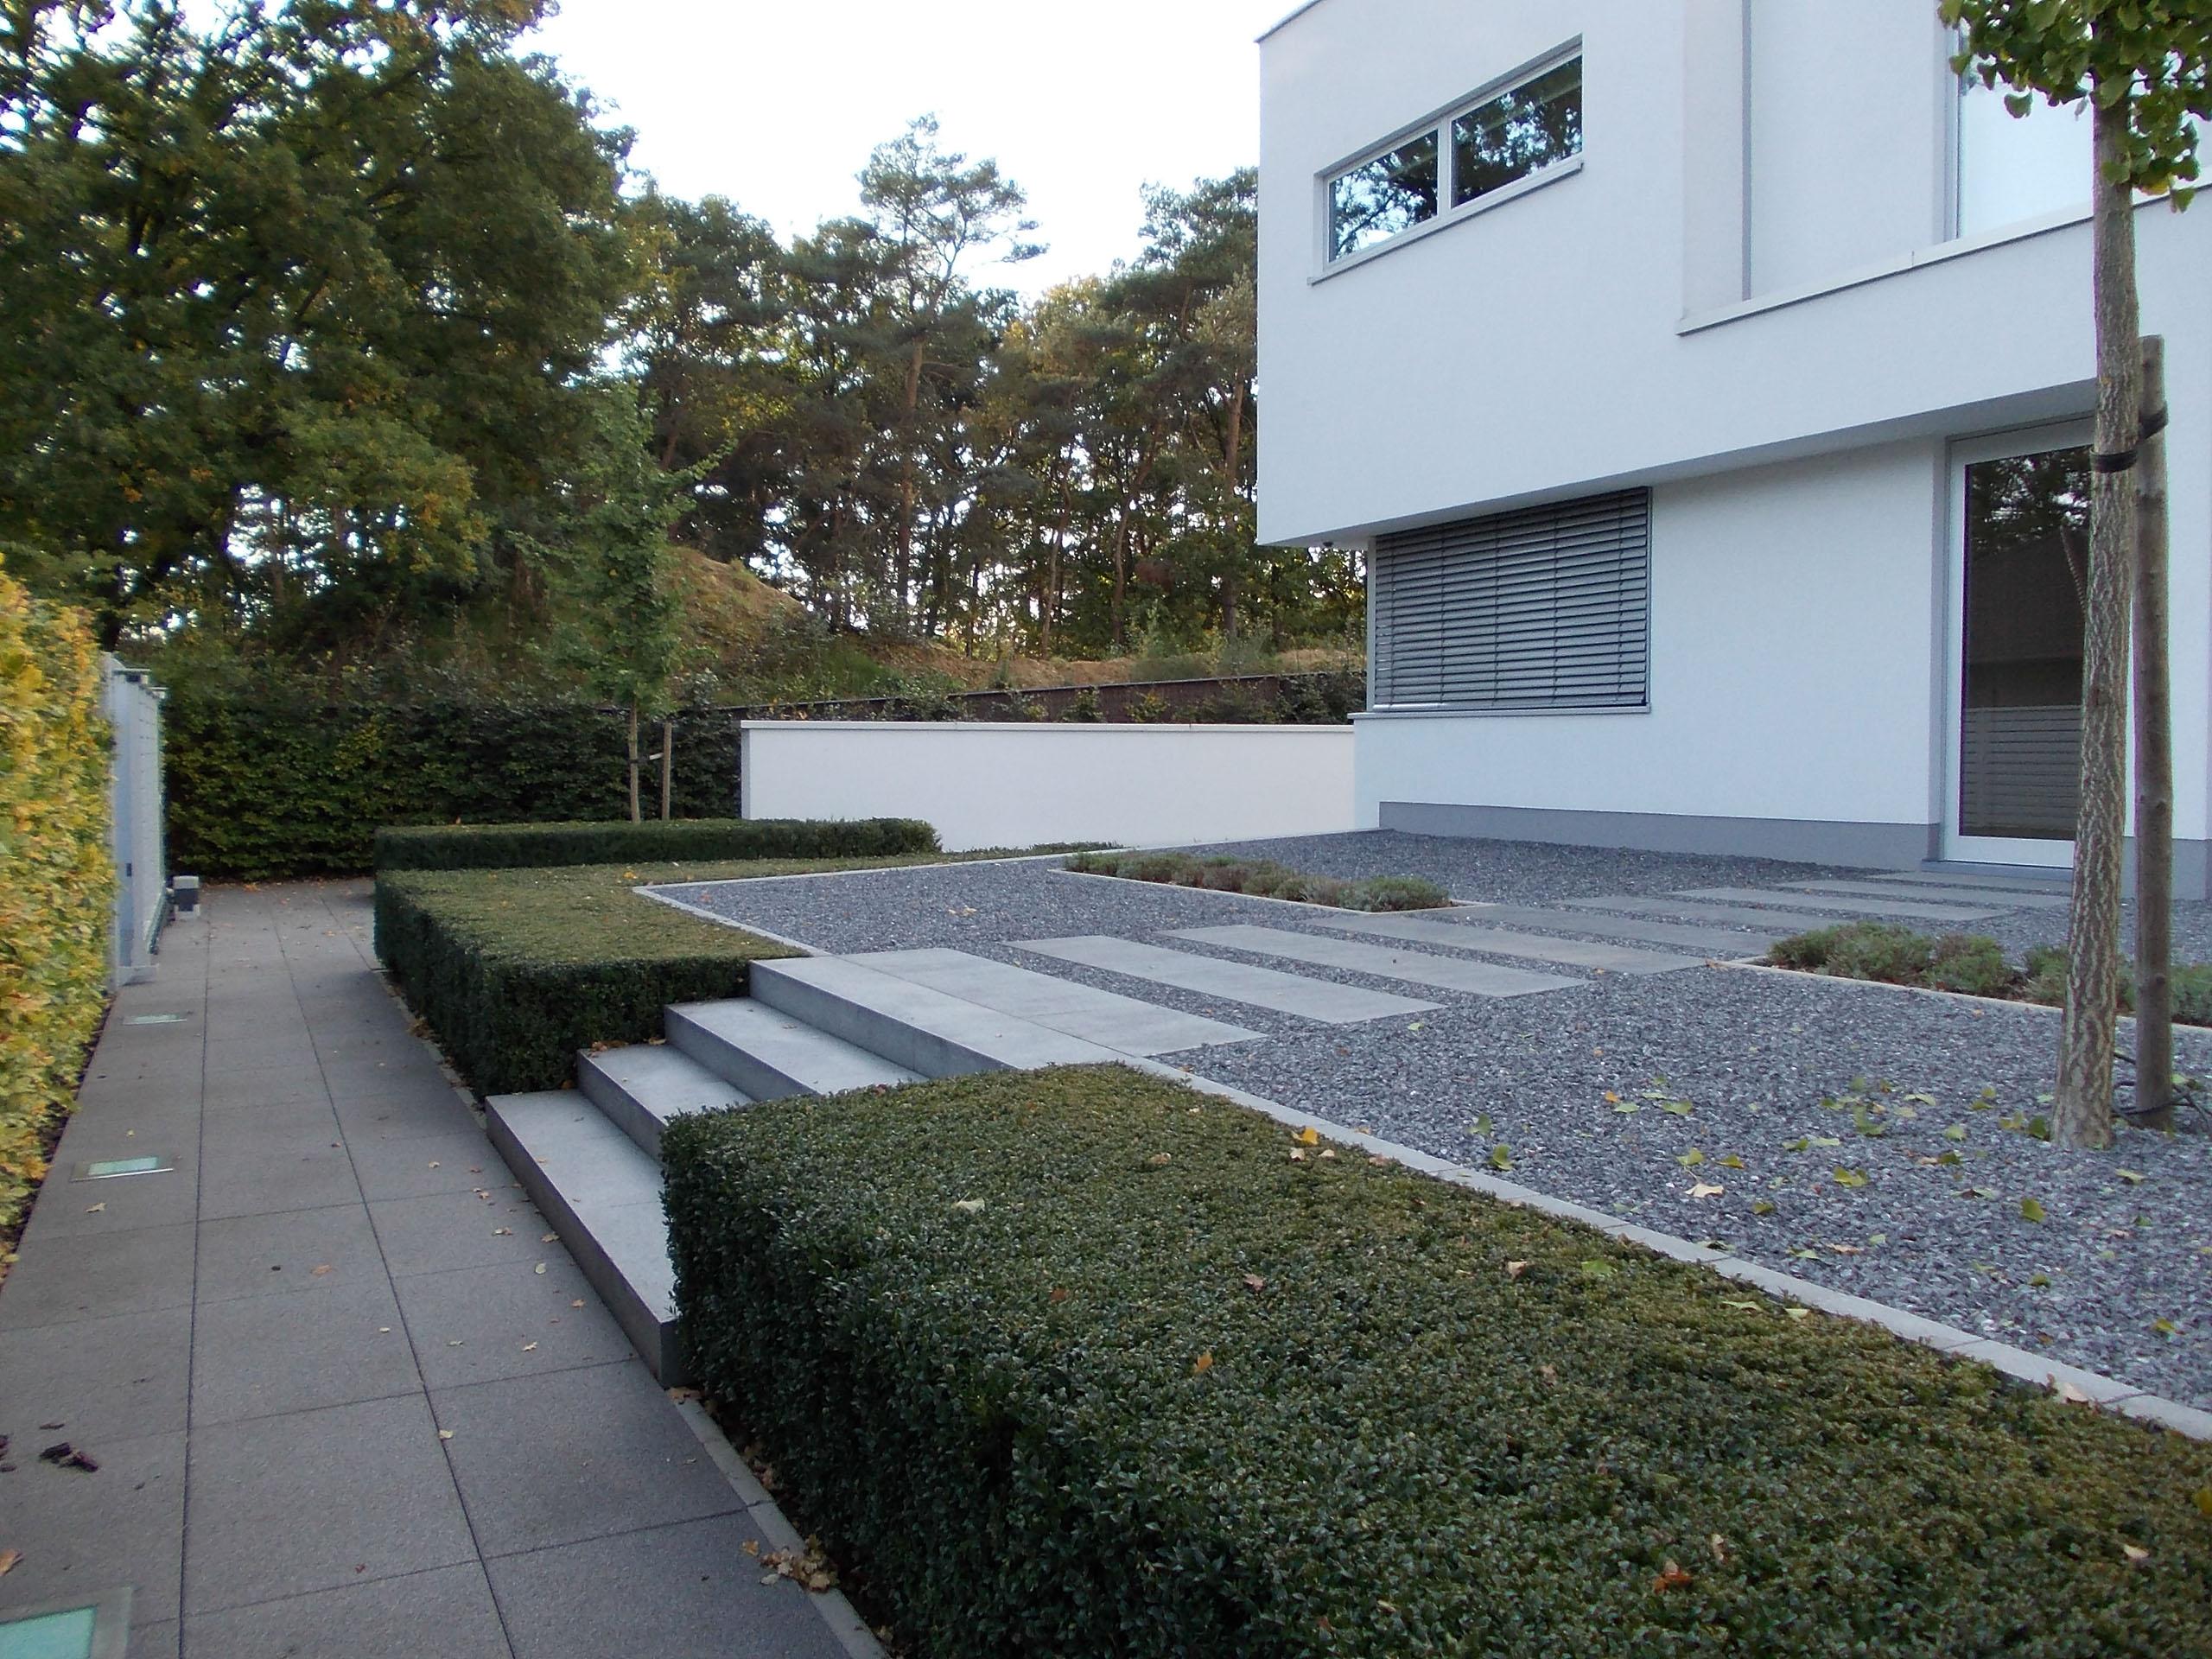 Tuinarchitect raymond martens strak hedendaags for Tuinarchitect modern strak